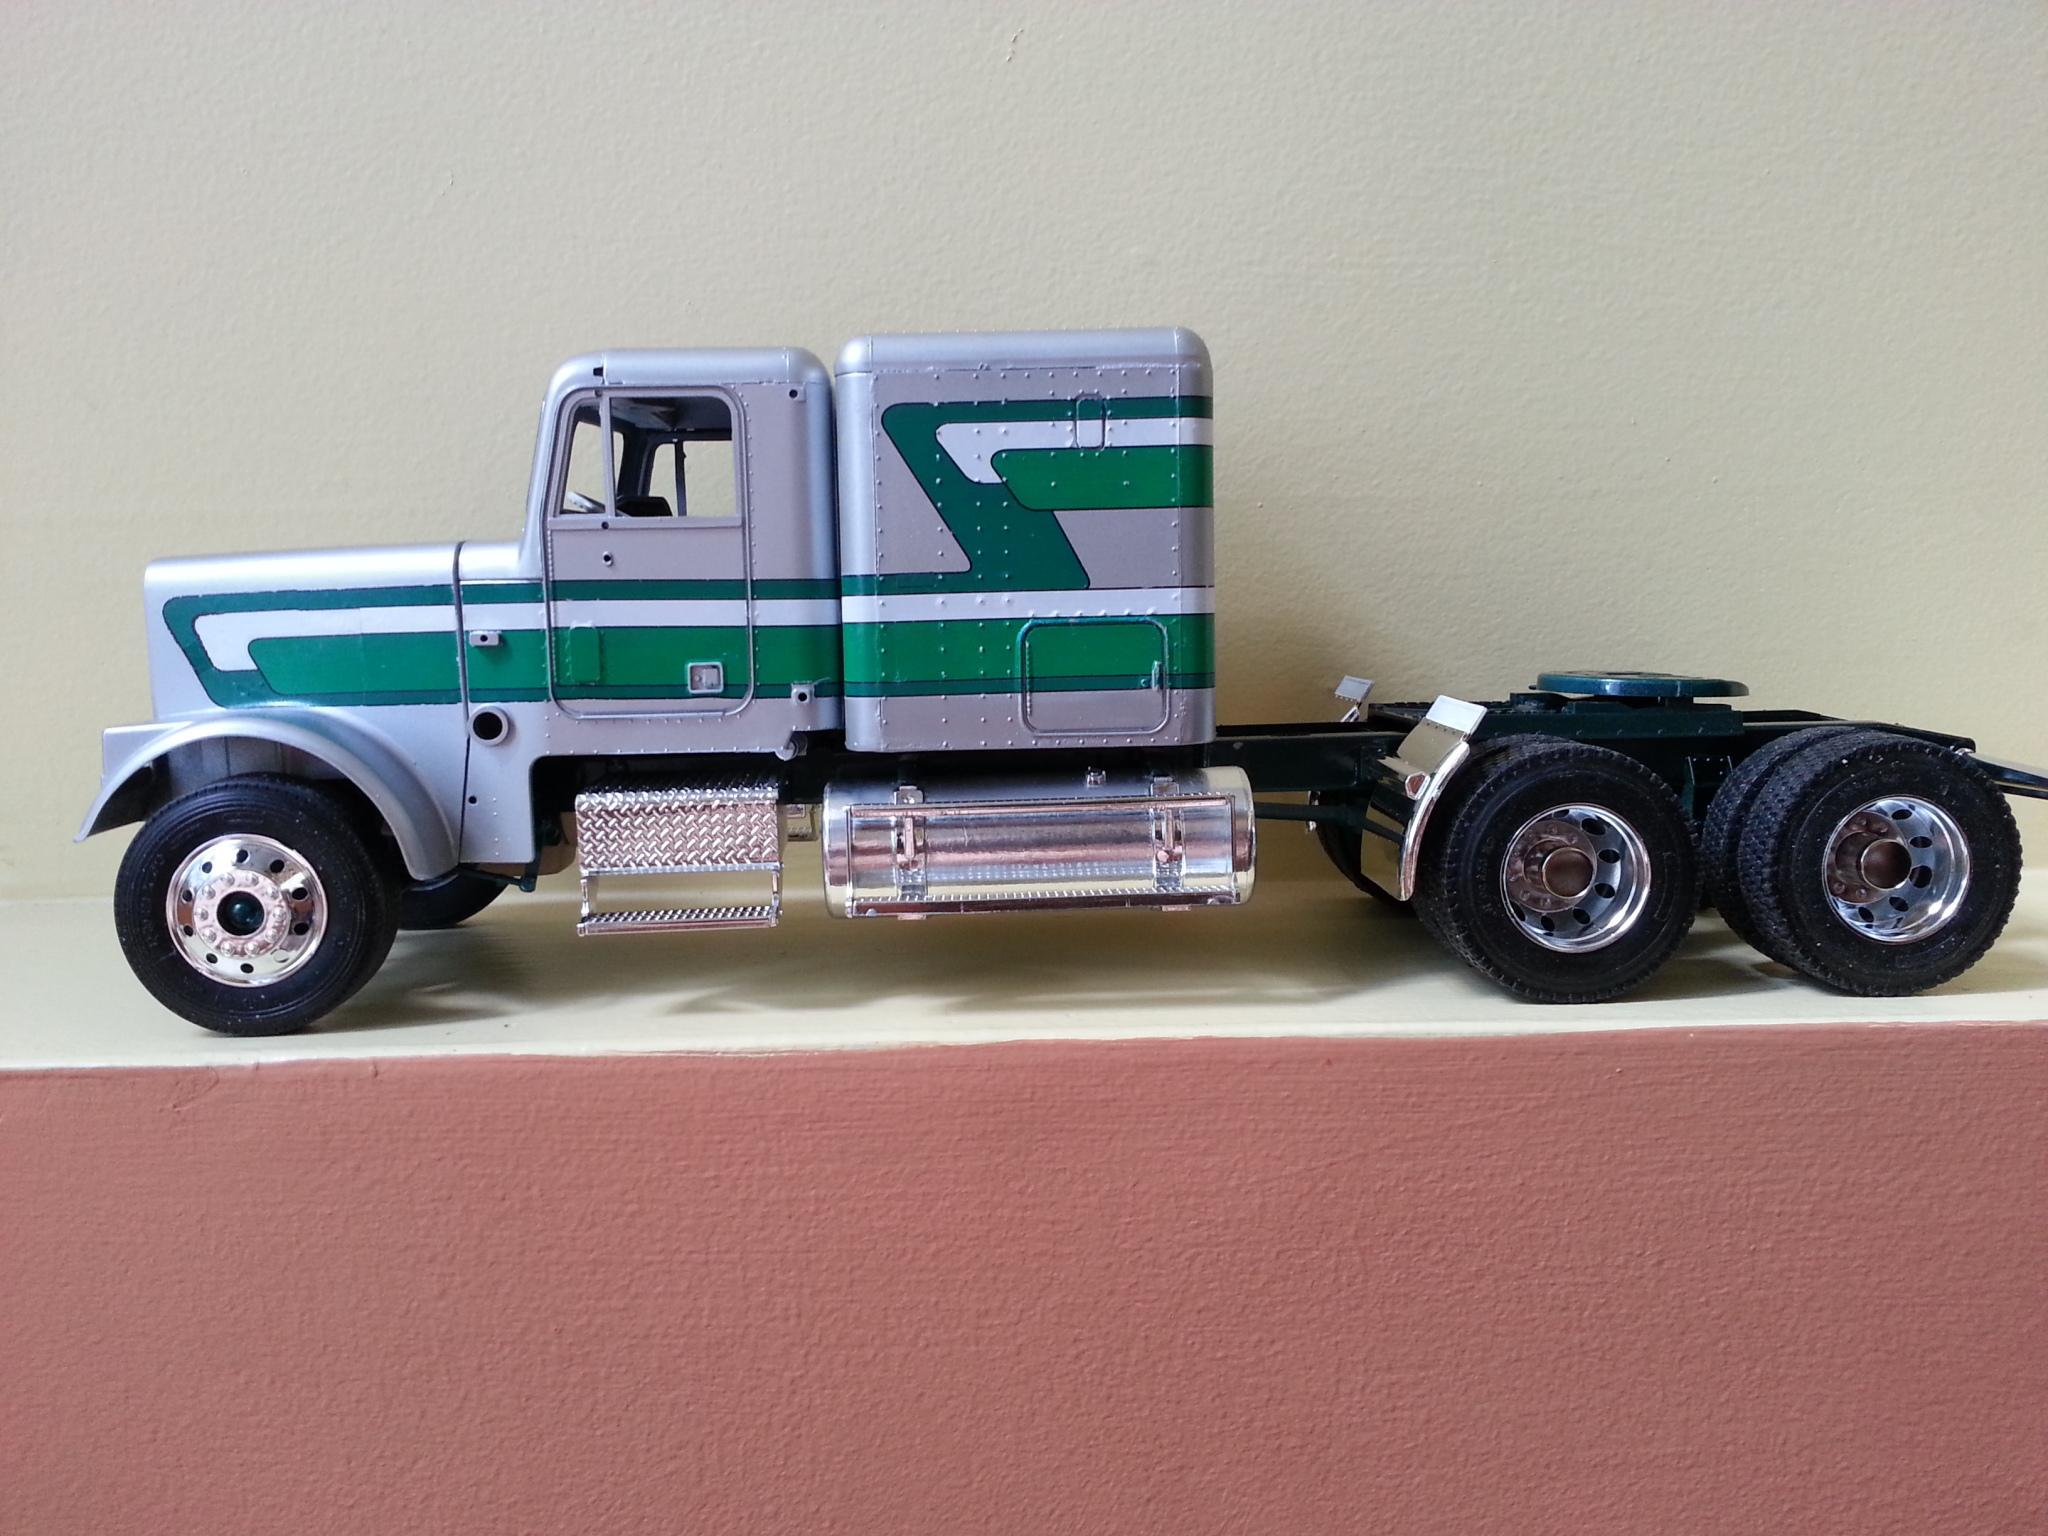 Freightliner FLC silver et vert I4qw07